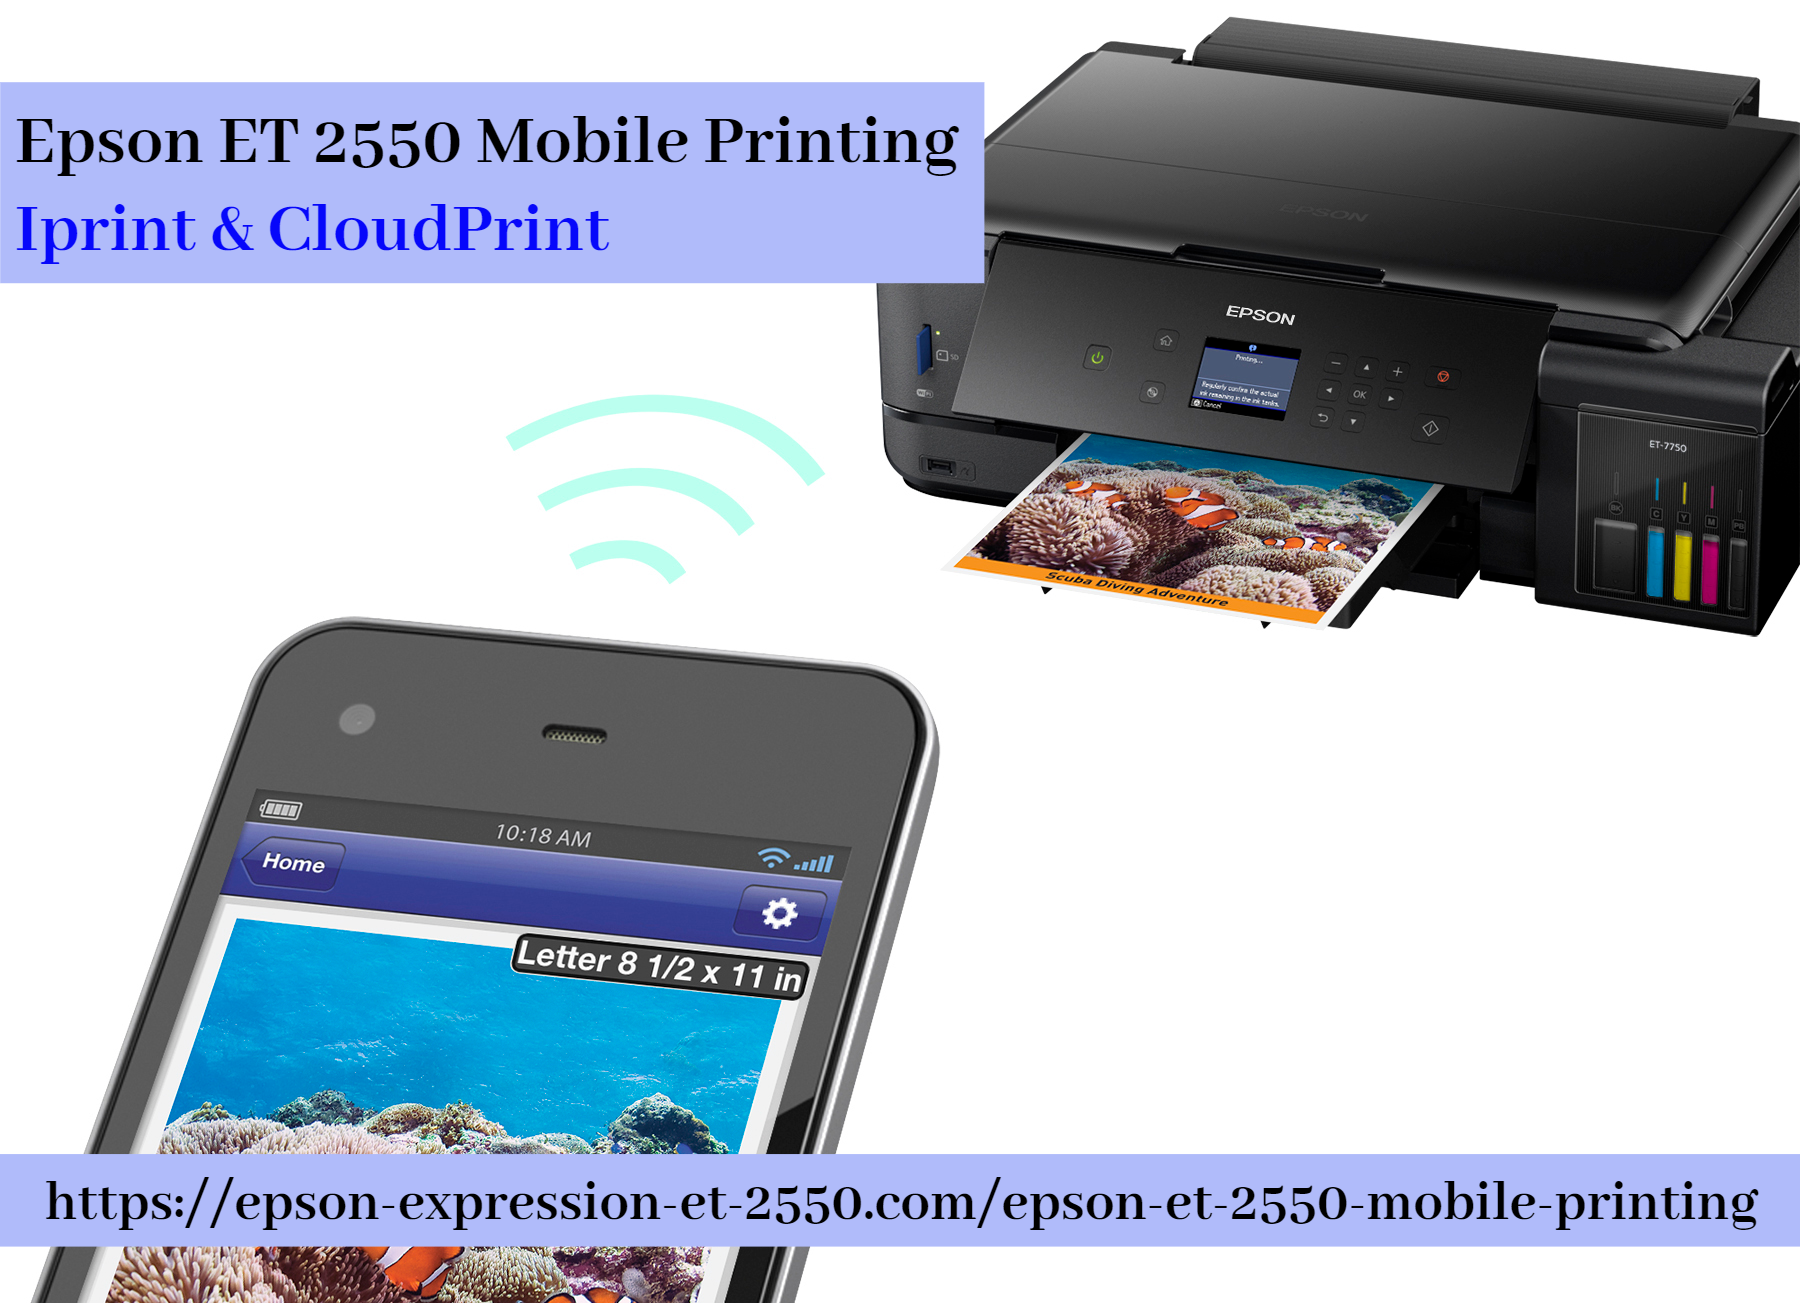 Epson Et 2550 Mobile Printing Iprint Cloudprint Mobile Print Printing Solution Printer